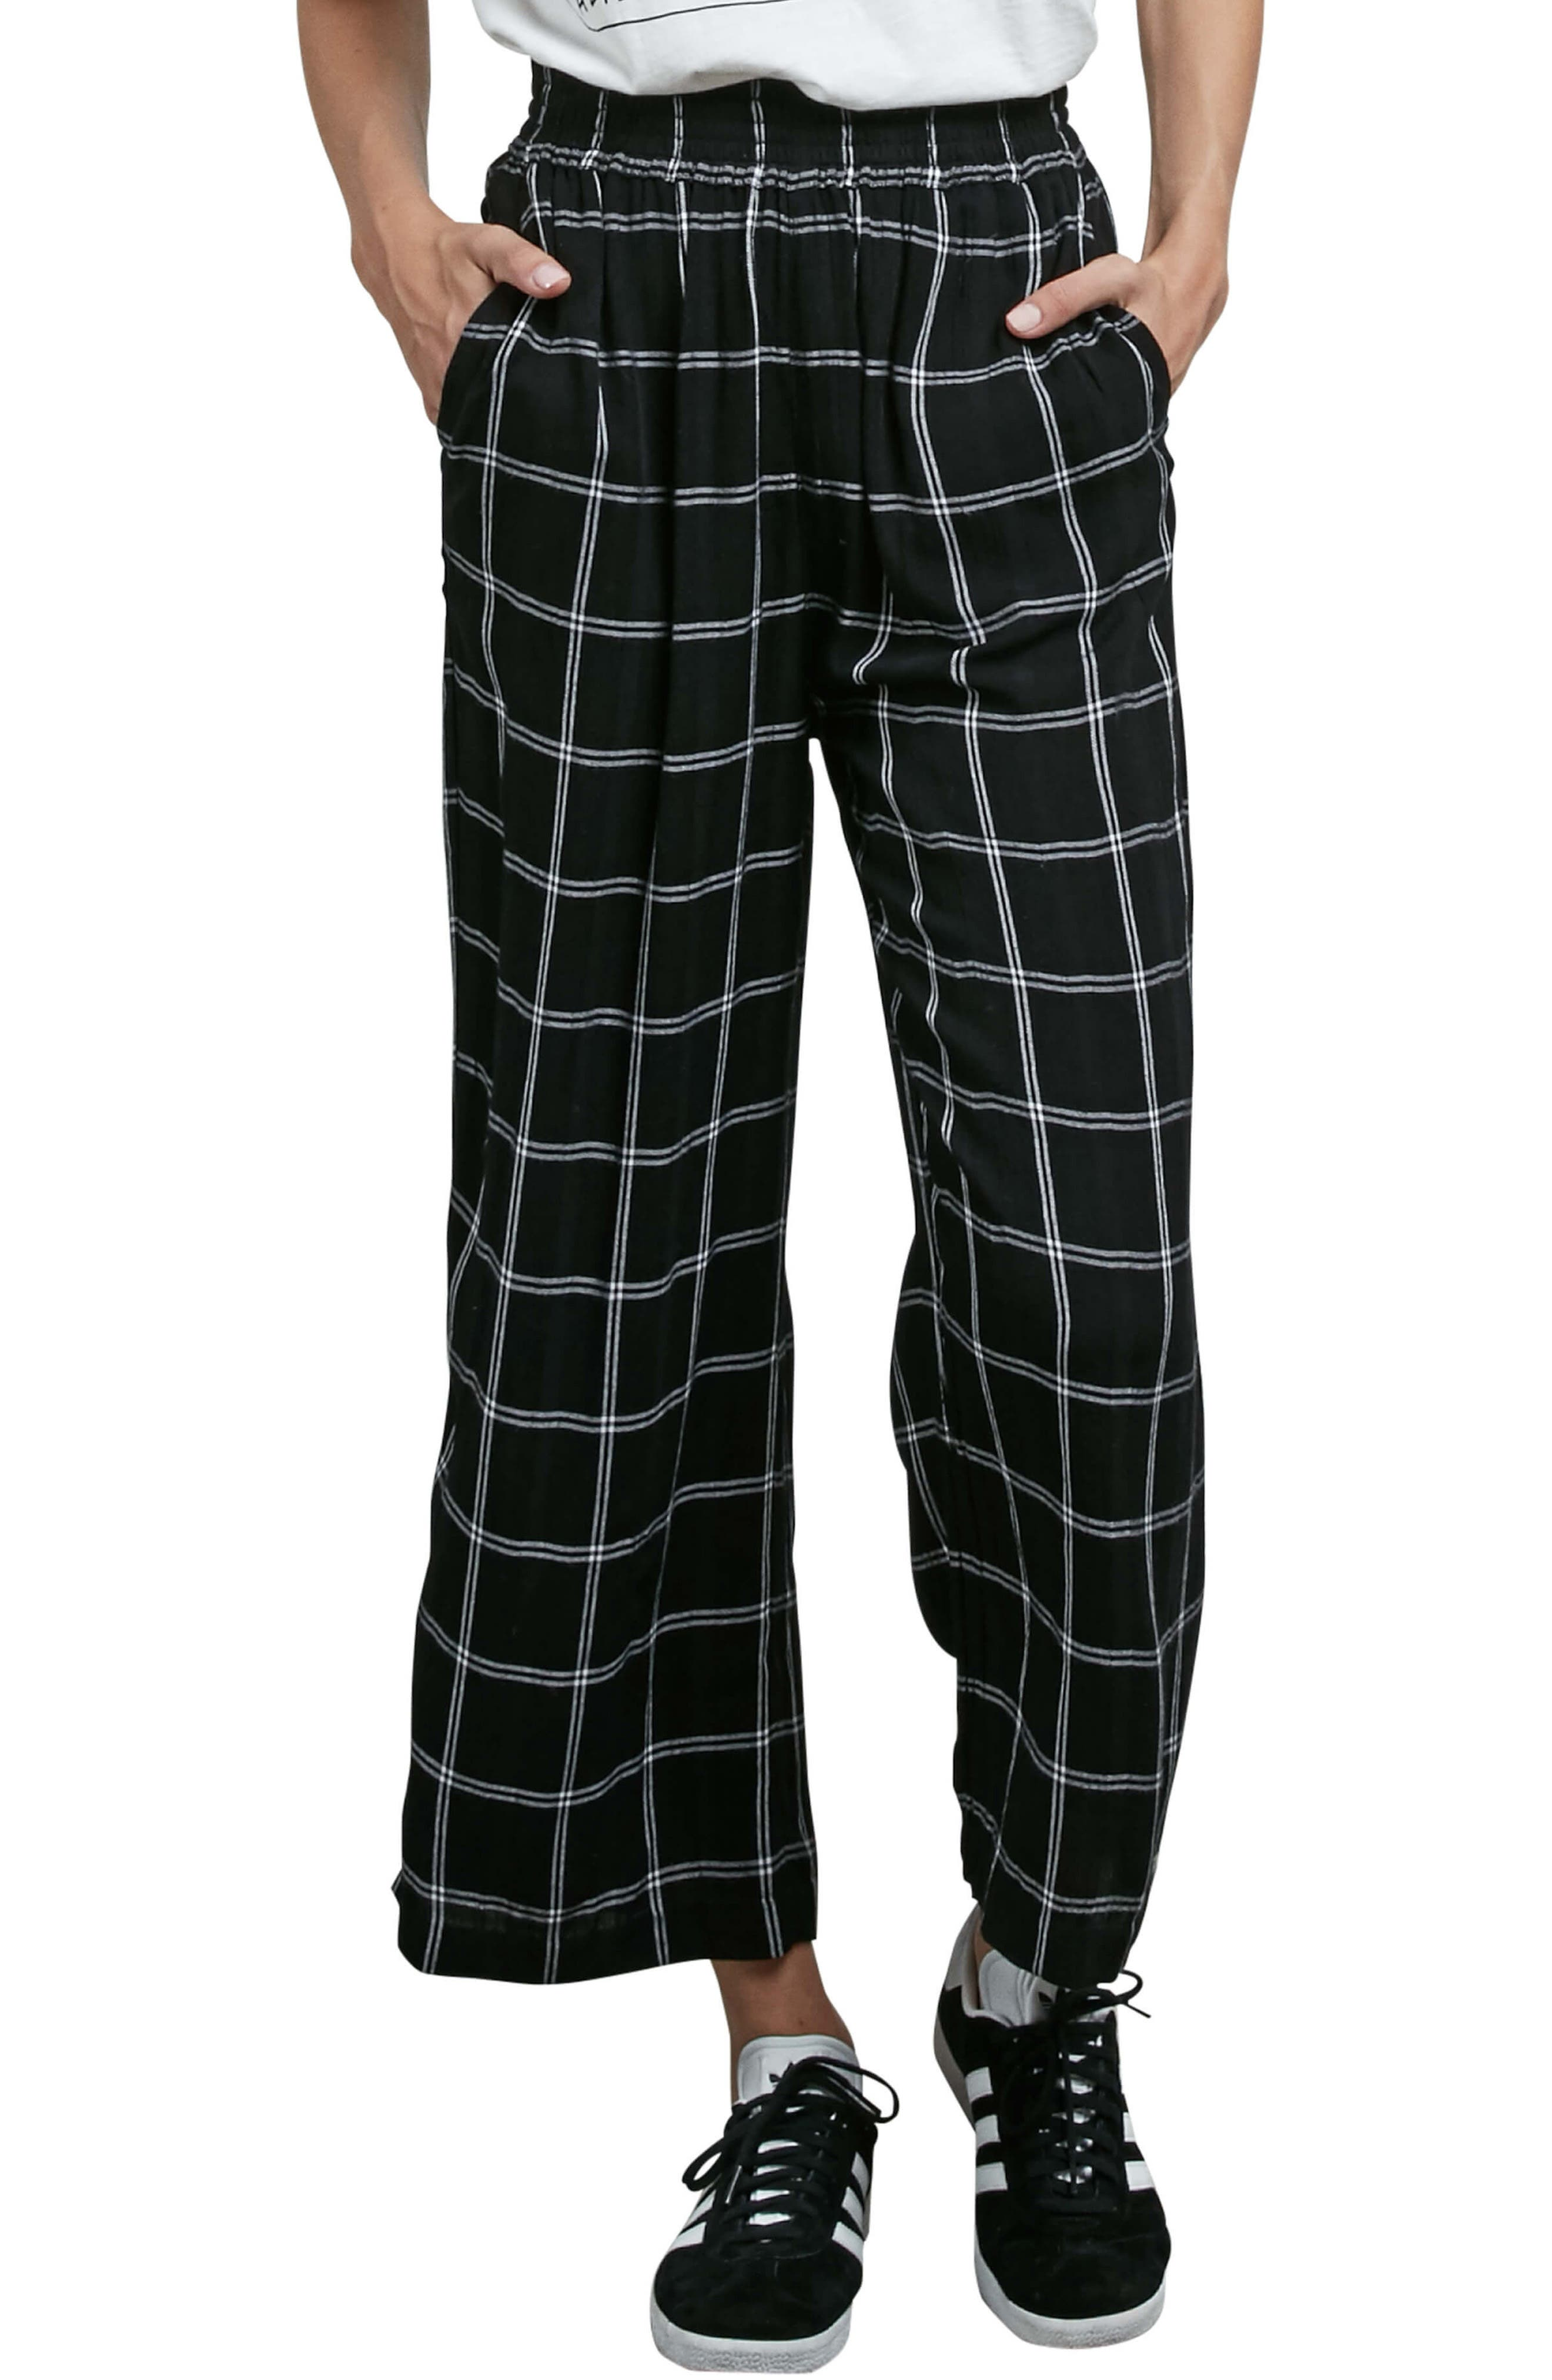 VOLCOM Jumponit Windowpane Crop Pants, Main, color, 001